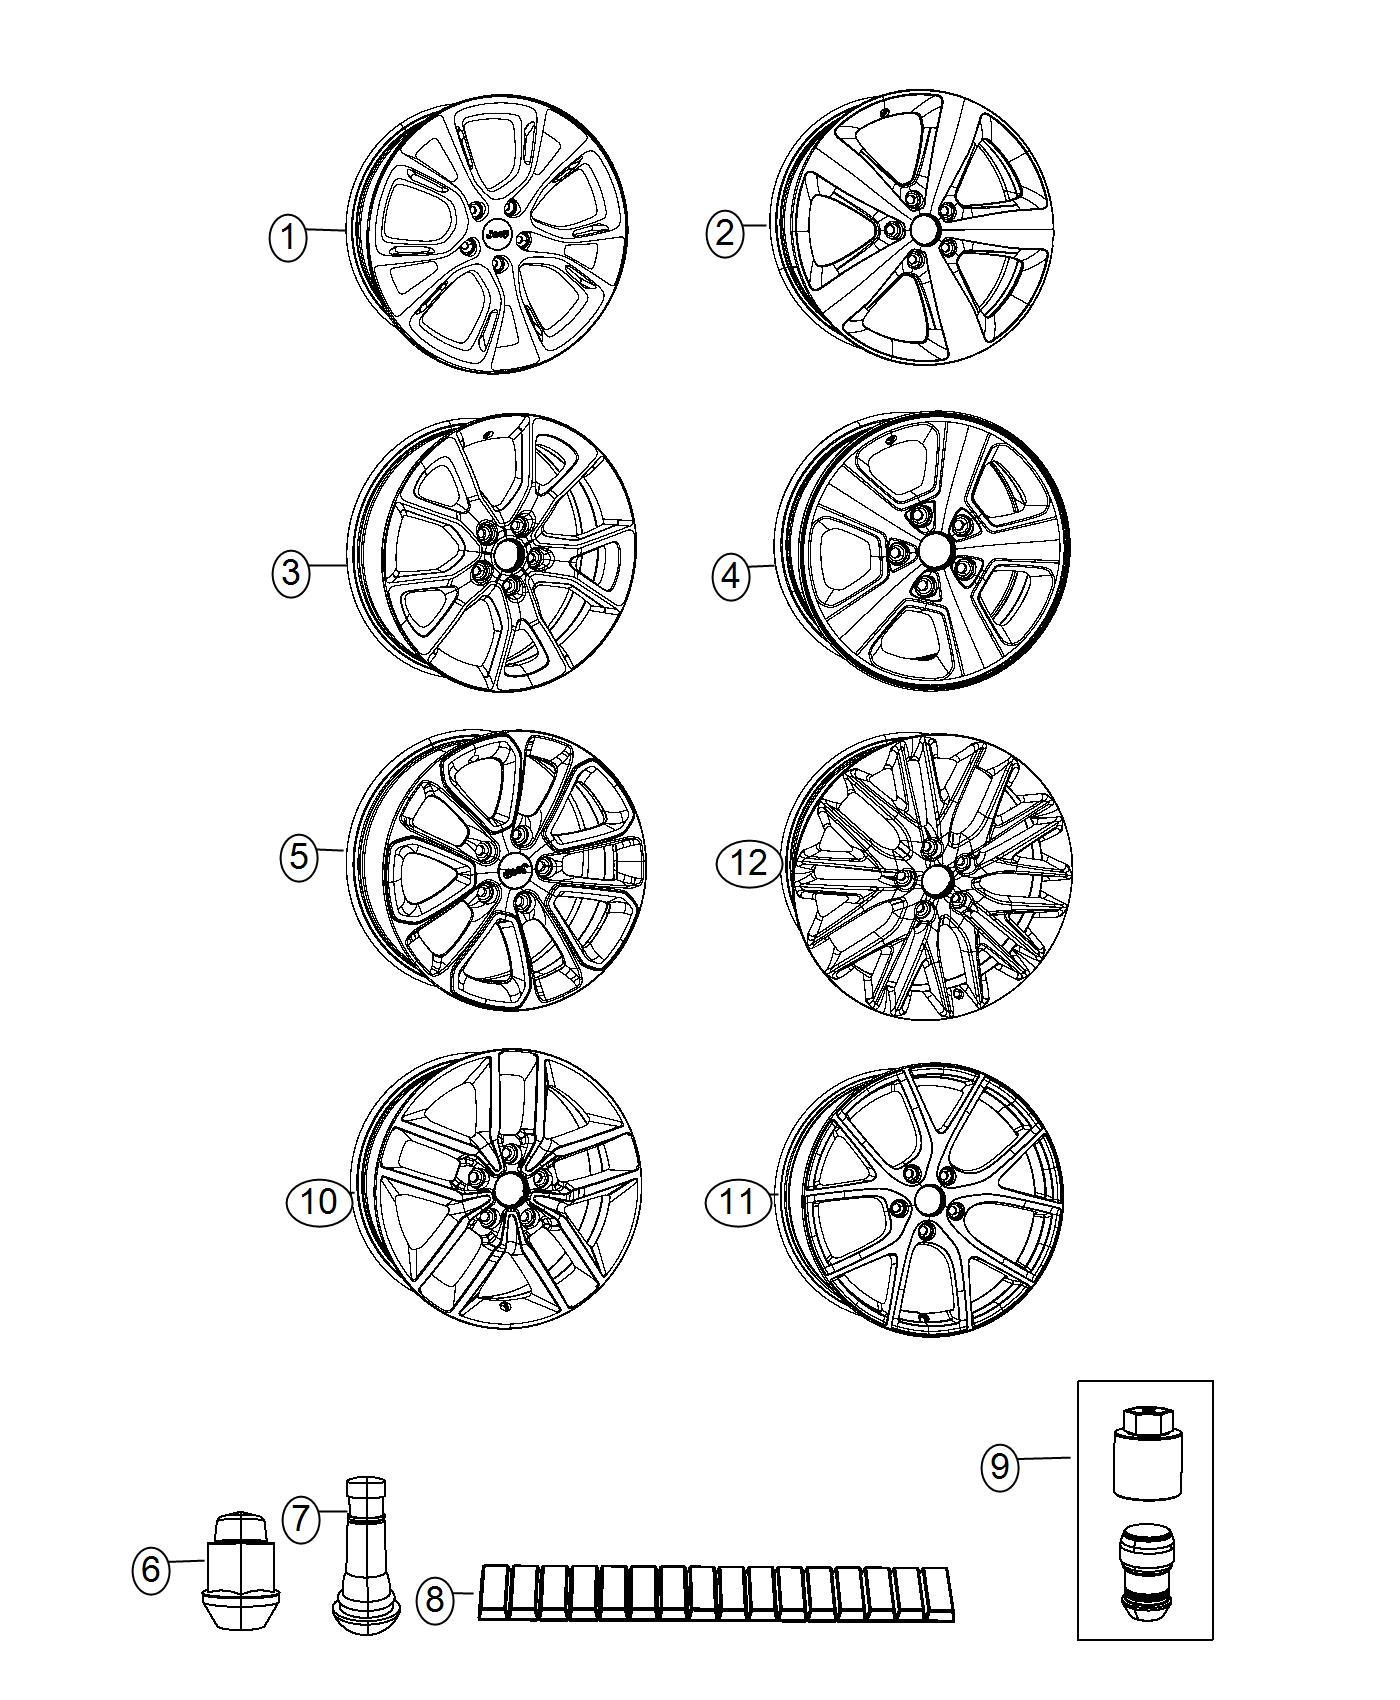 2016 Jeep Grand Cherokee Wheel. Front or rear. Aluminum